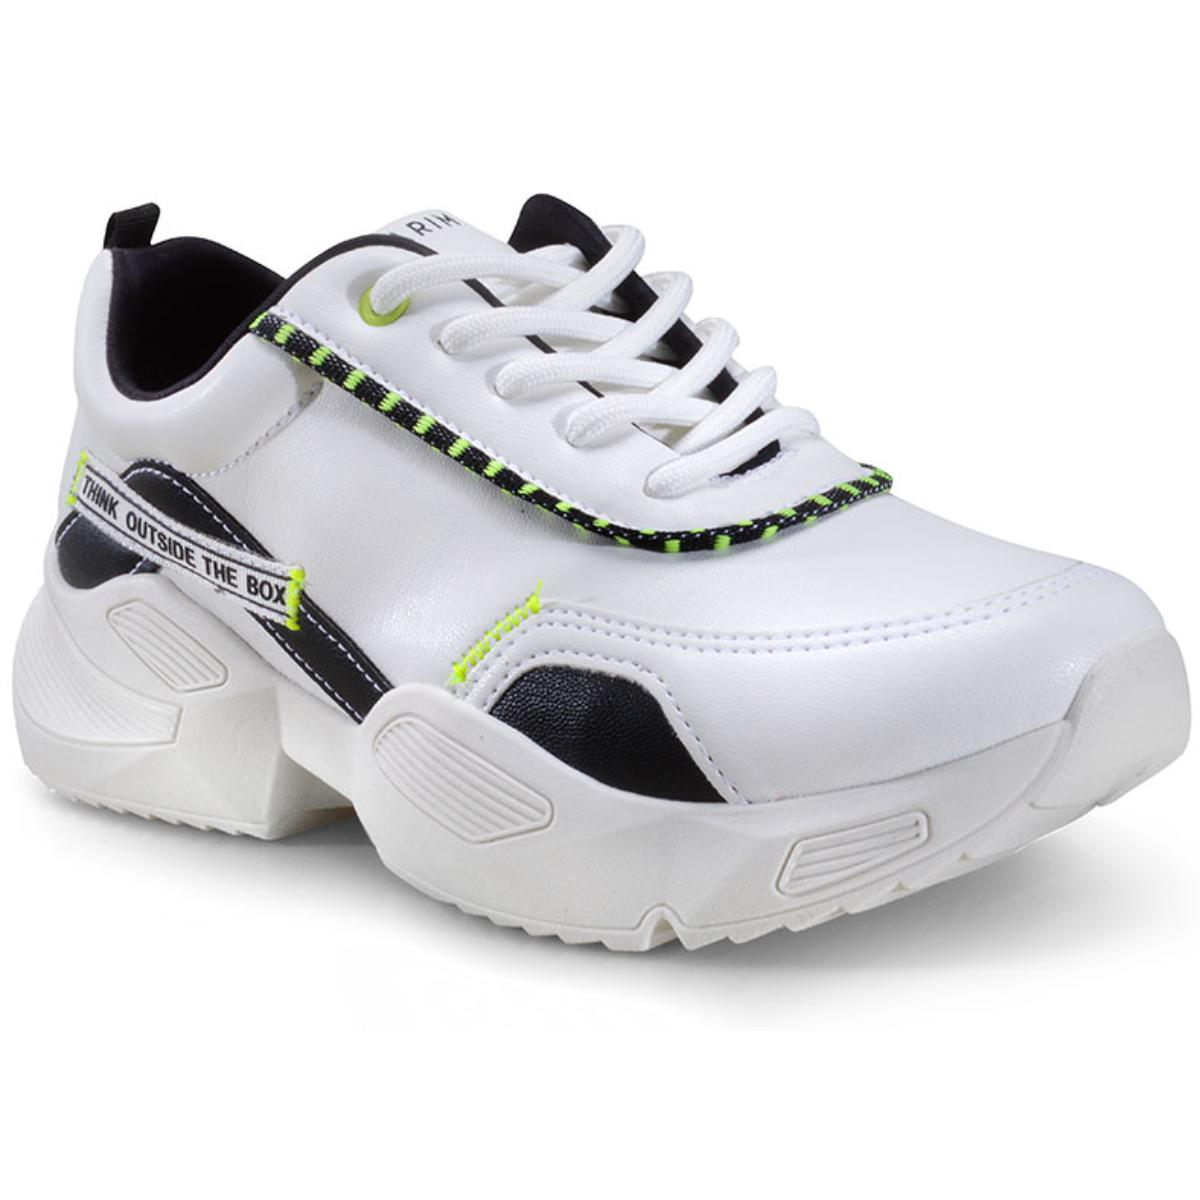 Tênis Feminino Ramarim 20-82231 Branco/preto Neon